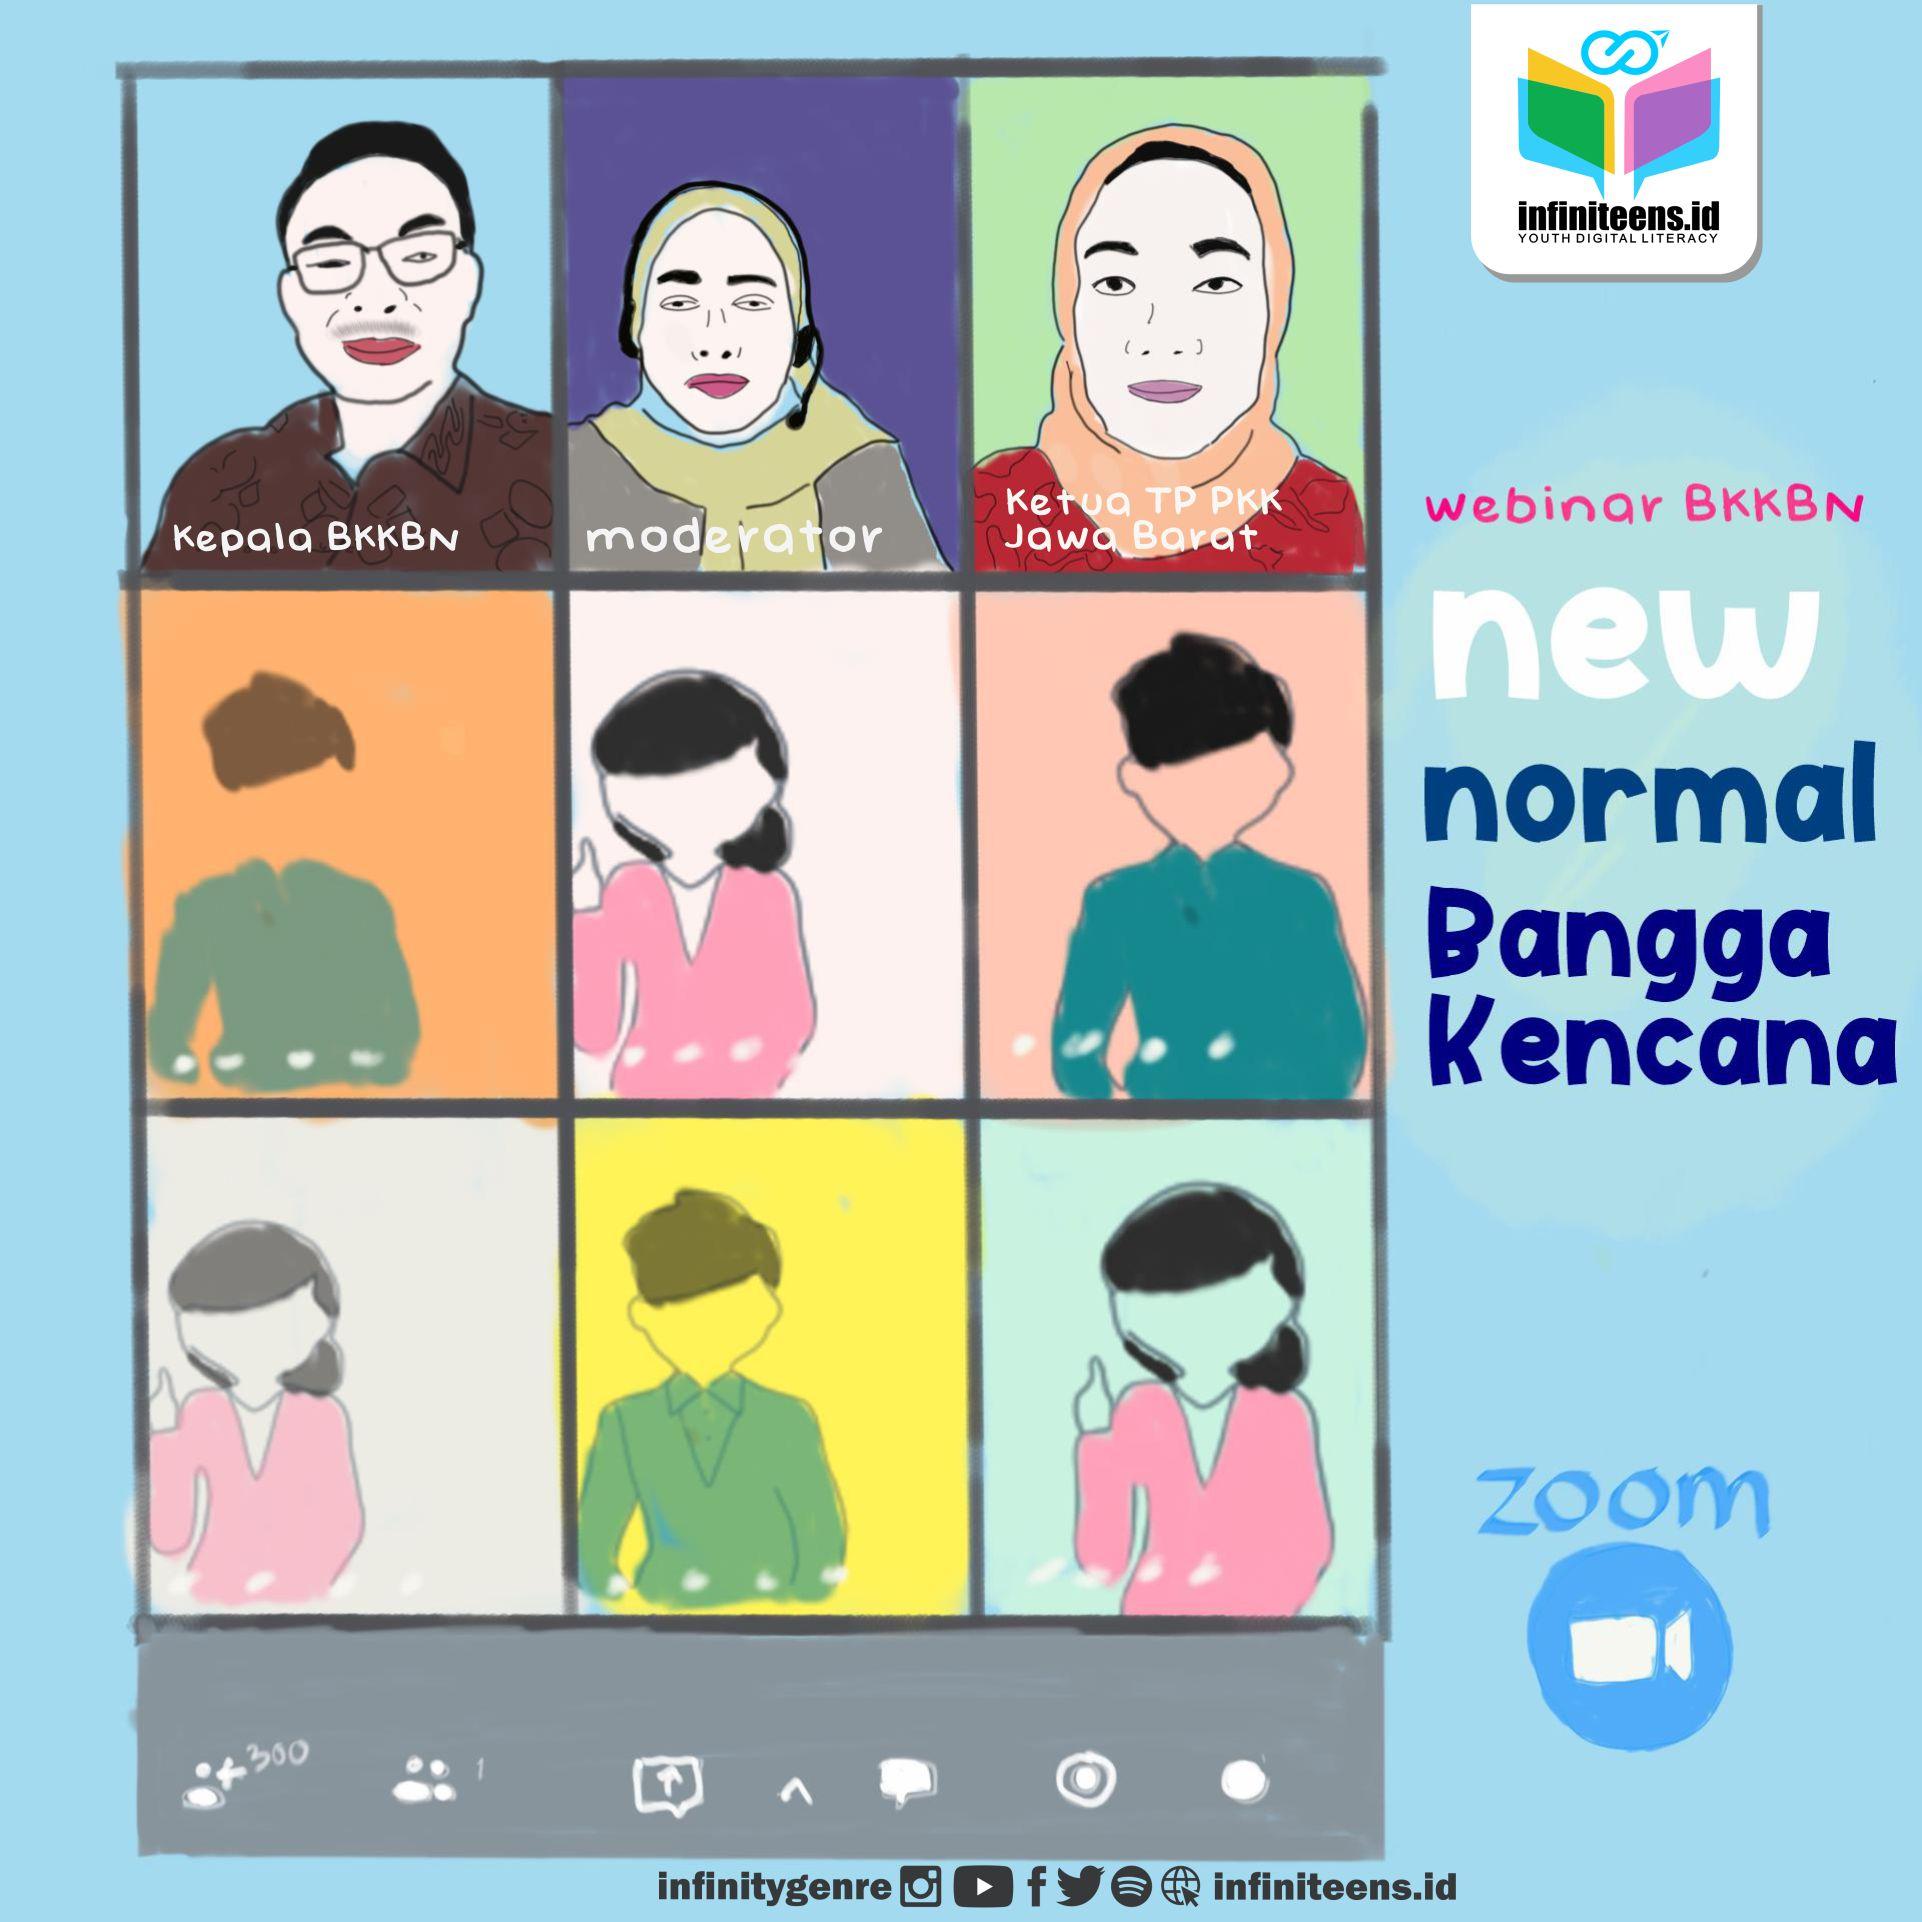 Webinar BKKBN Series: Masuki New Normal, BKKBN Keluarkan Tiga Kebijakan Baru